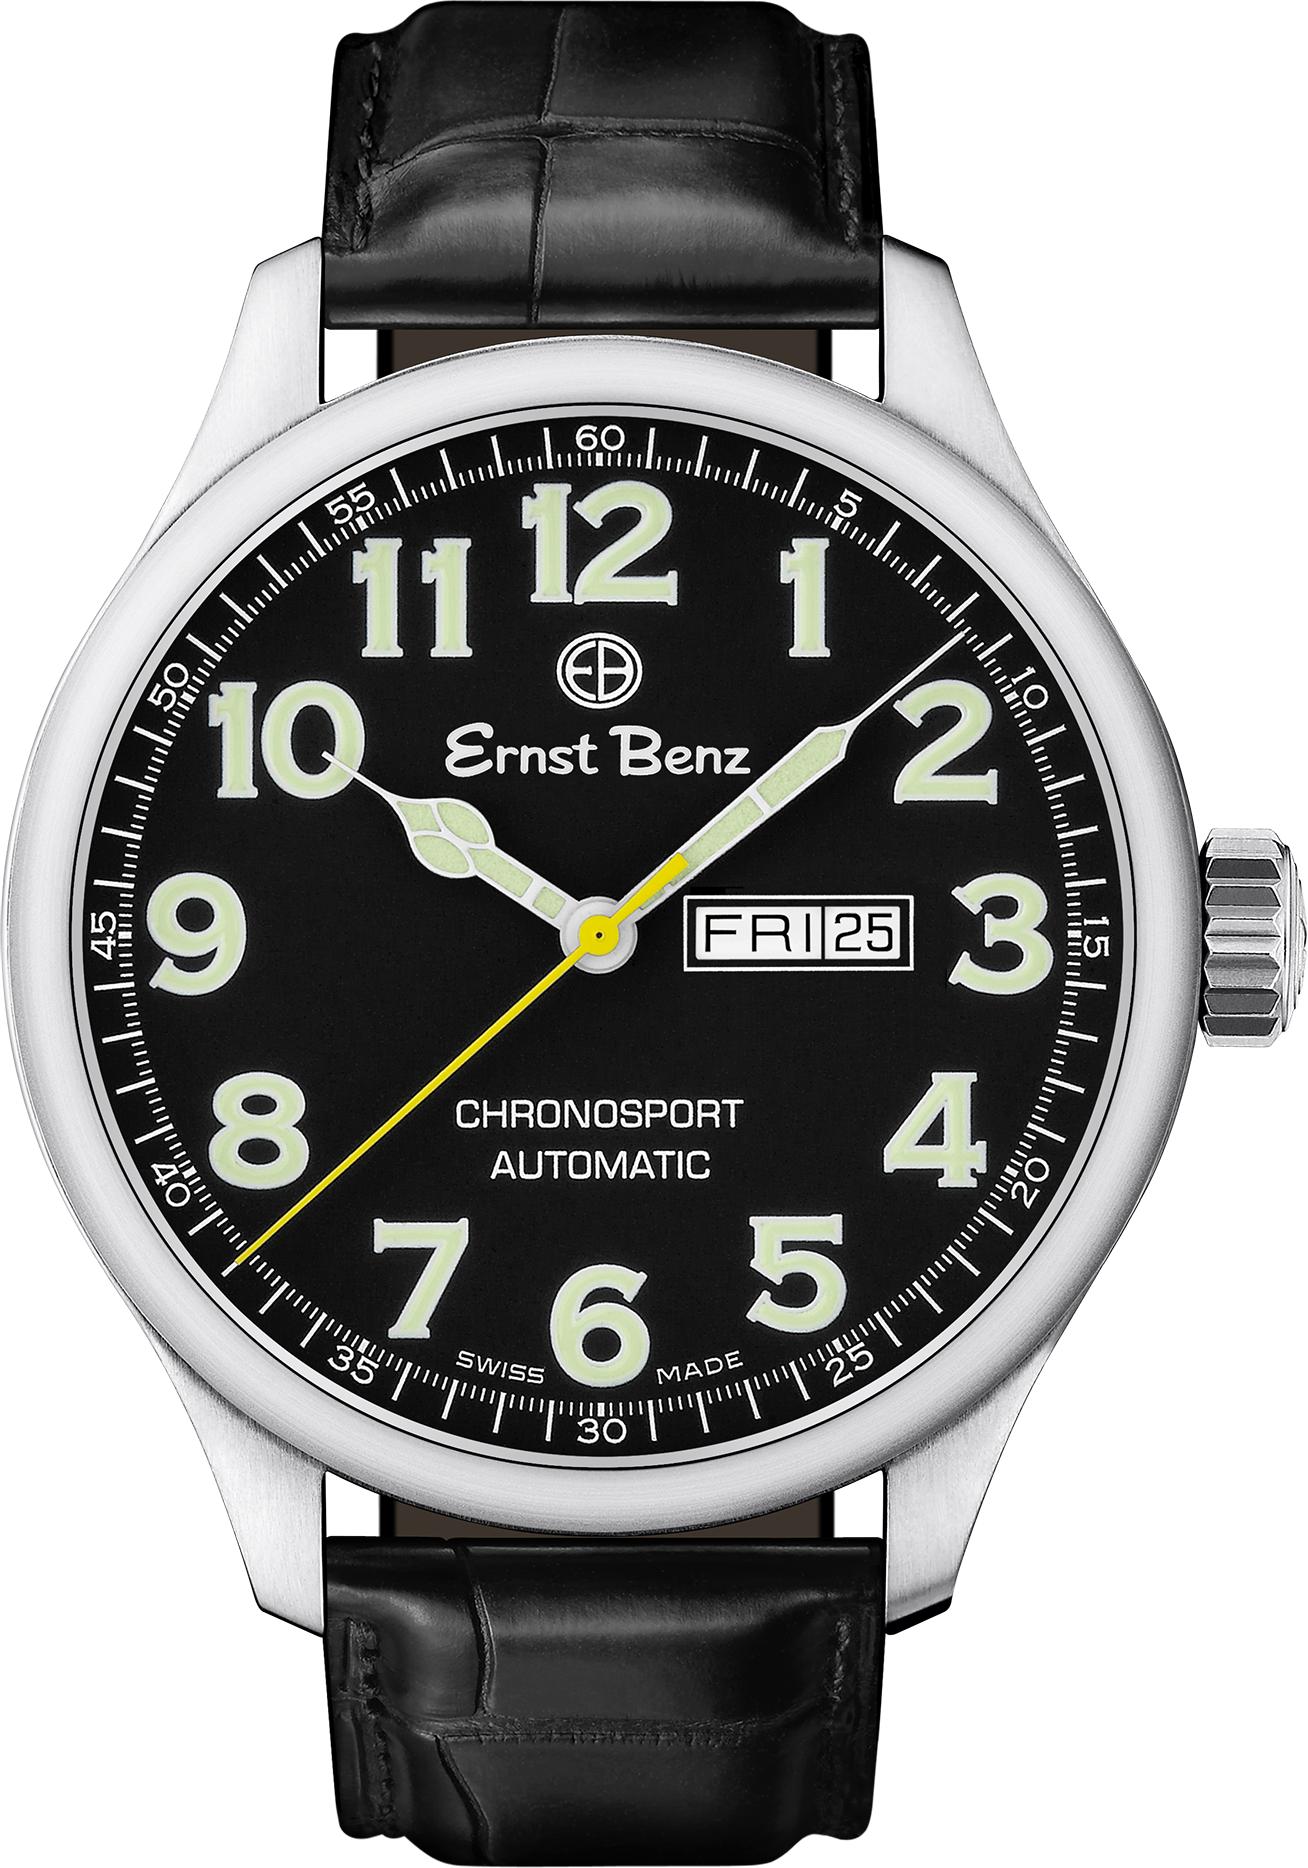 Ernst Benz Chronosport GC10211/A